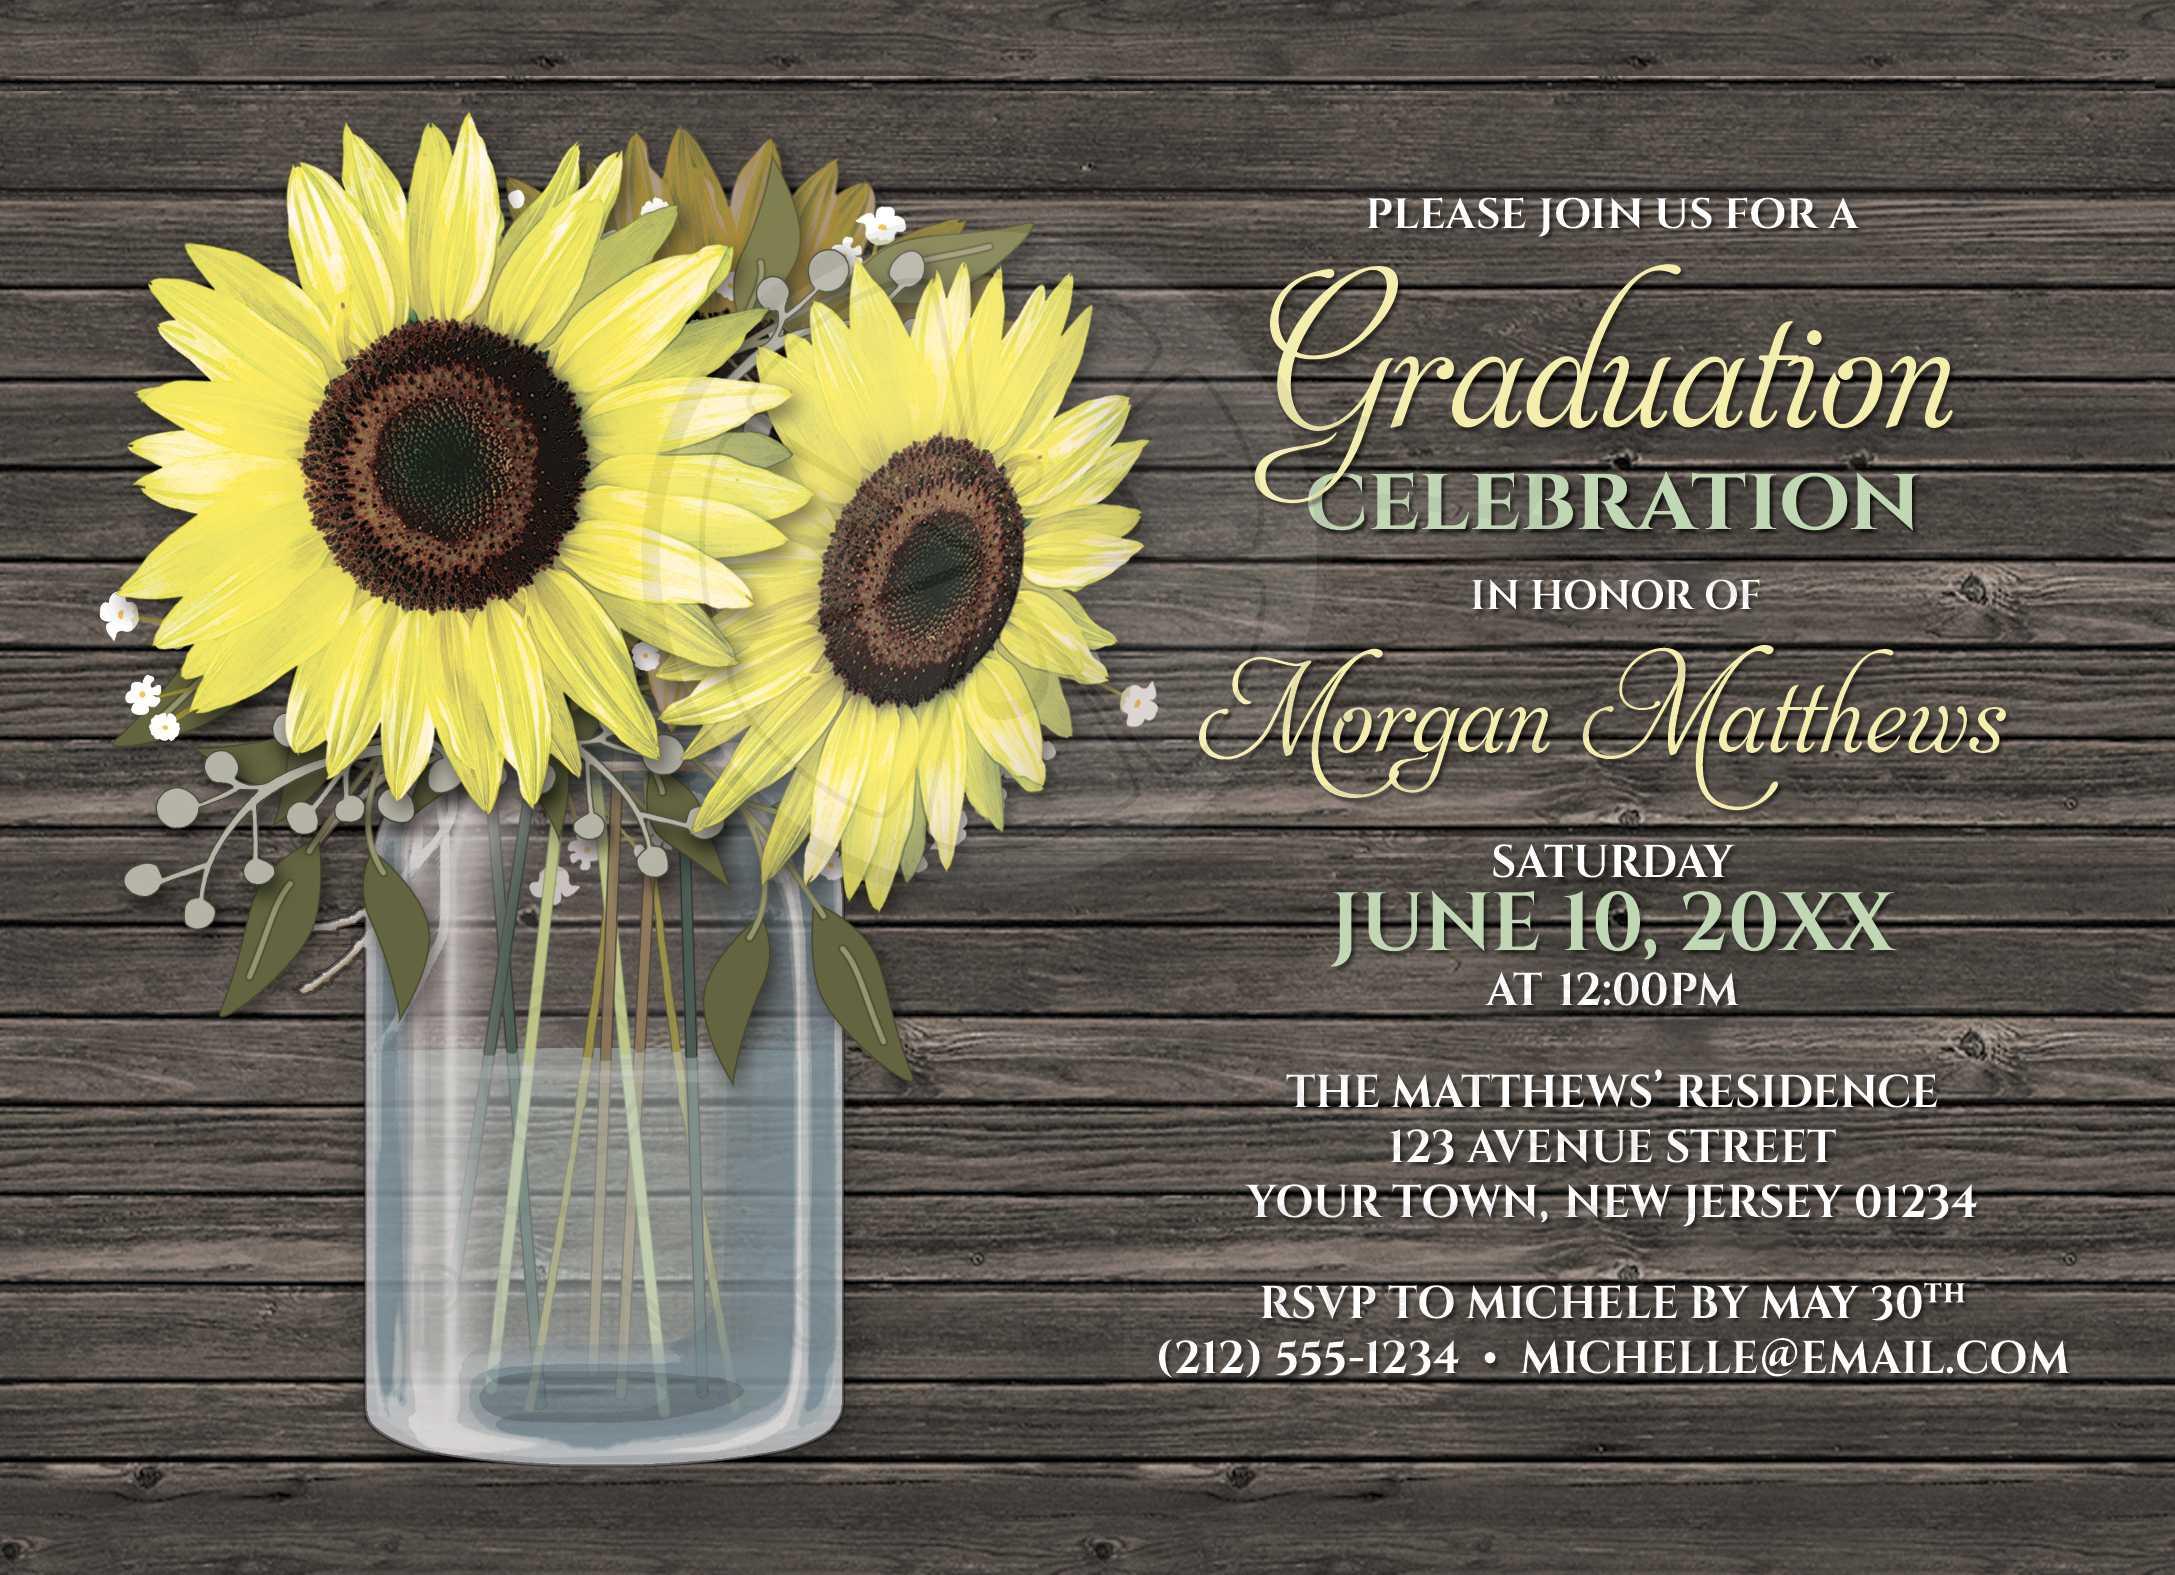 Graduation Invitations - Rustic Sunflower Wood Mason Jar